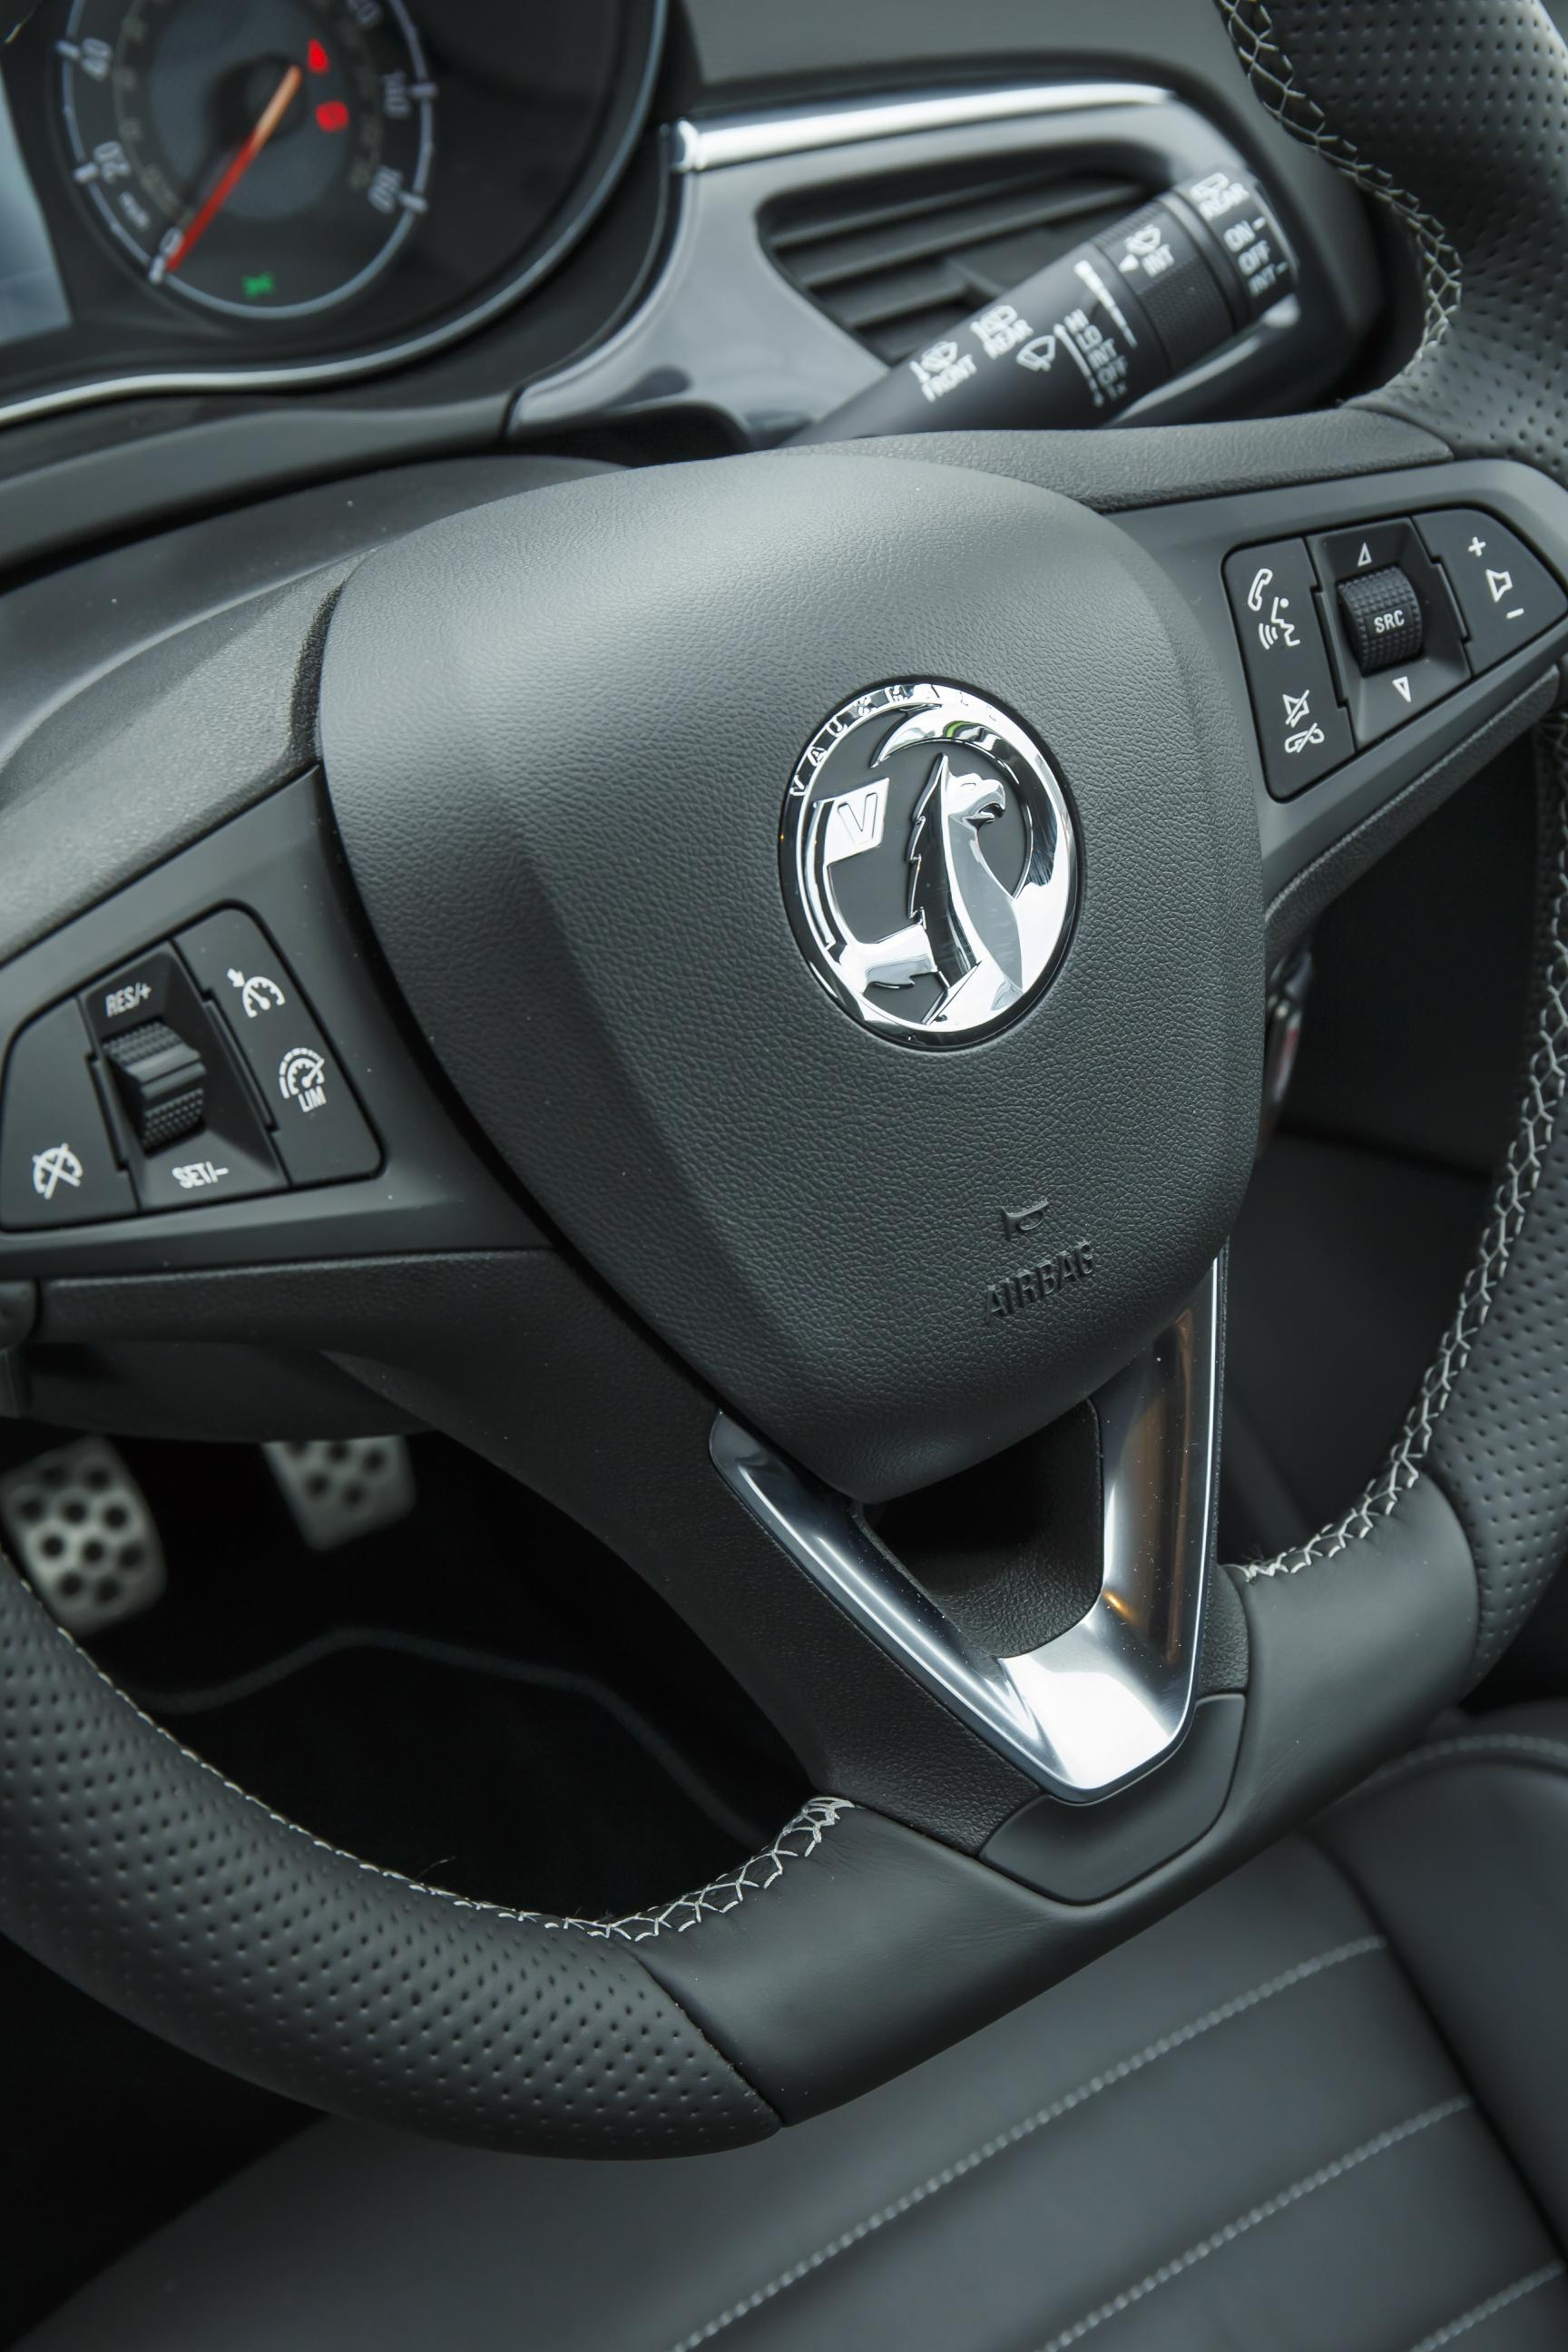 Vauxhall Corsa stirring wheel